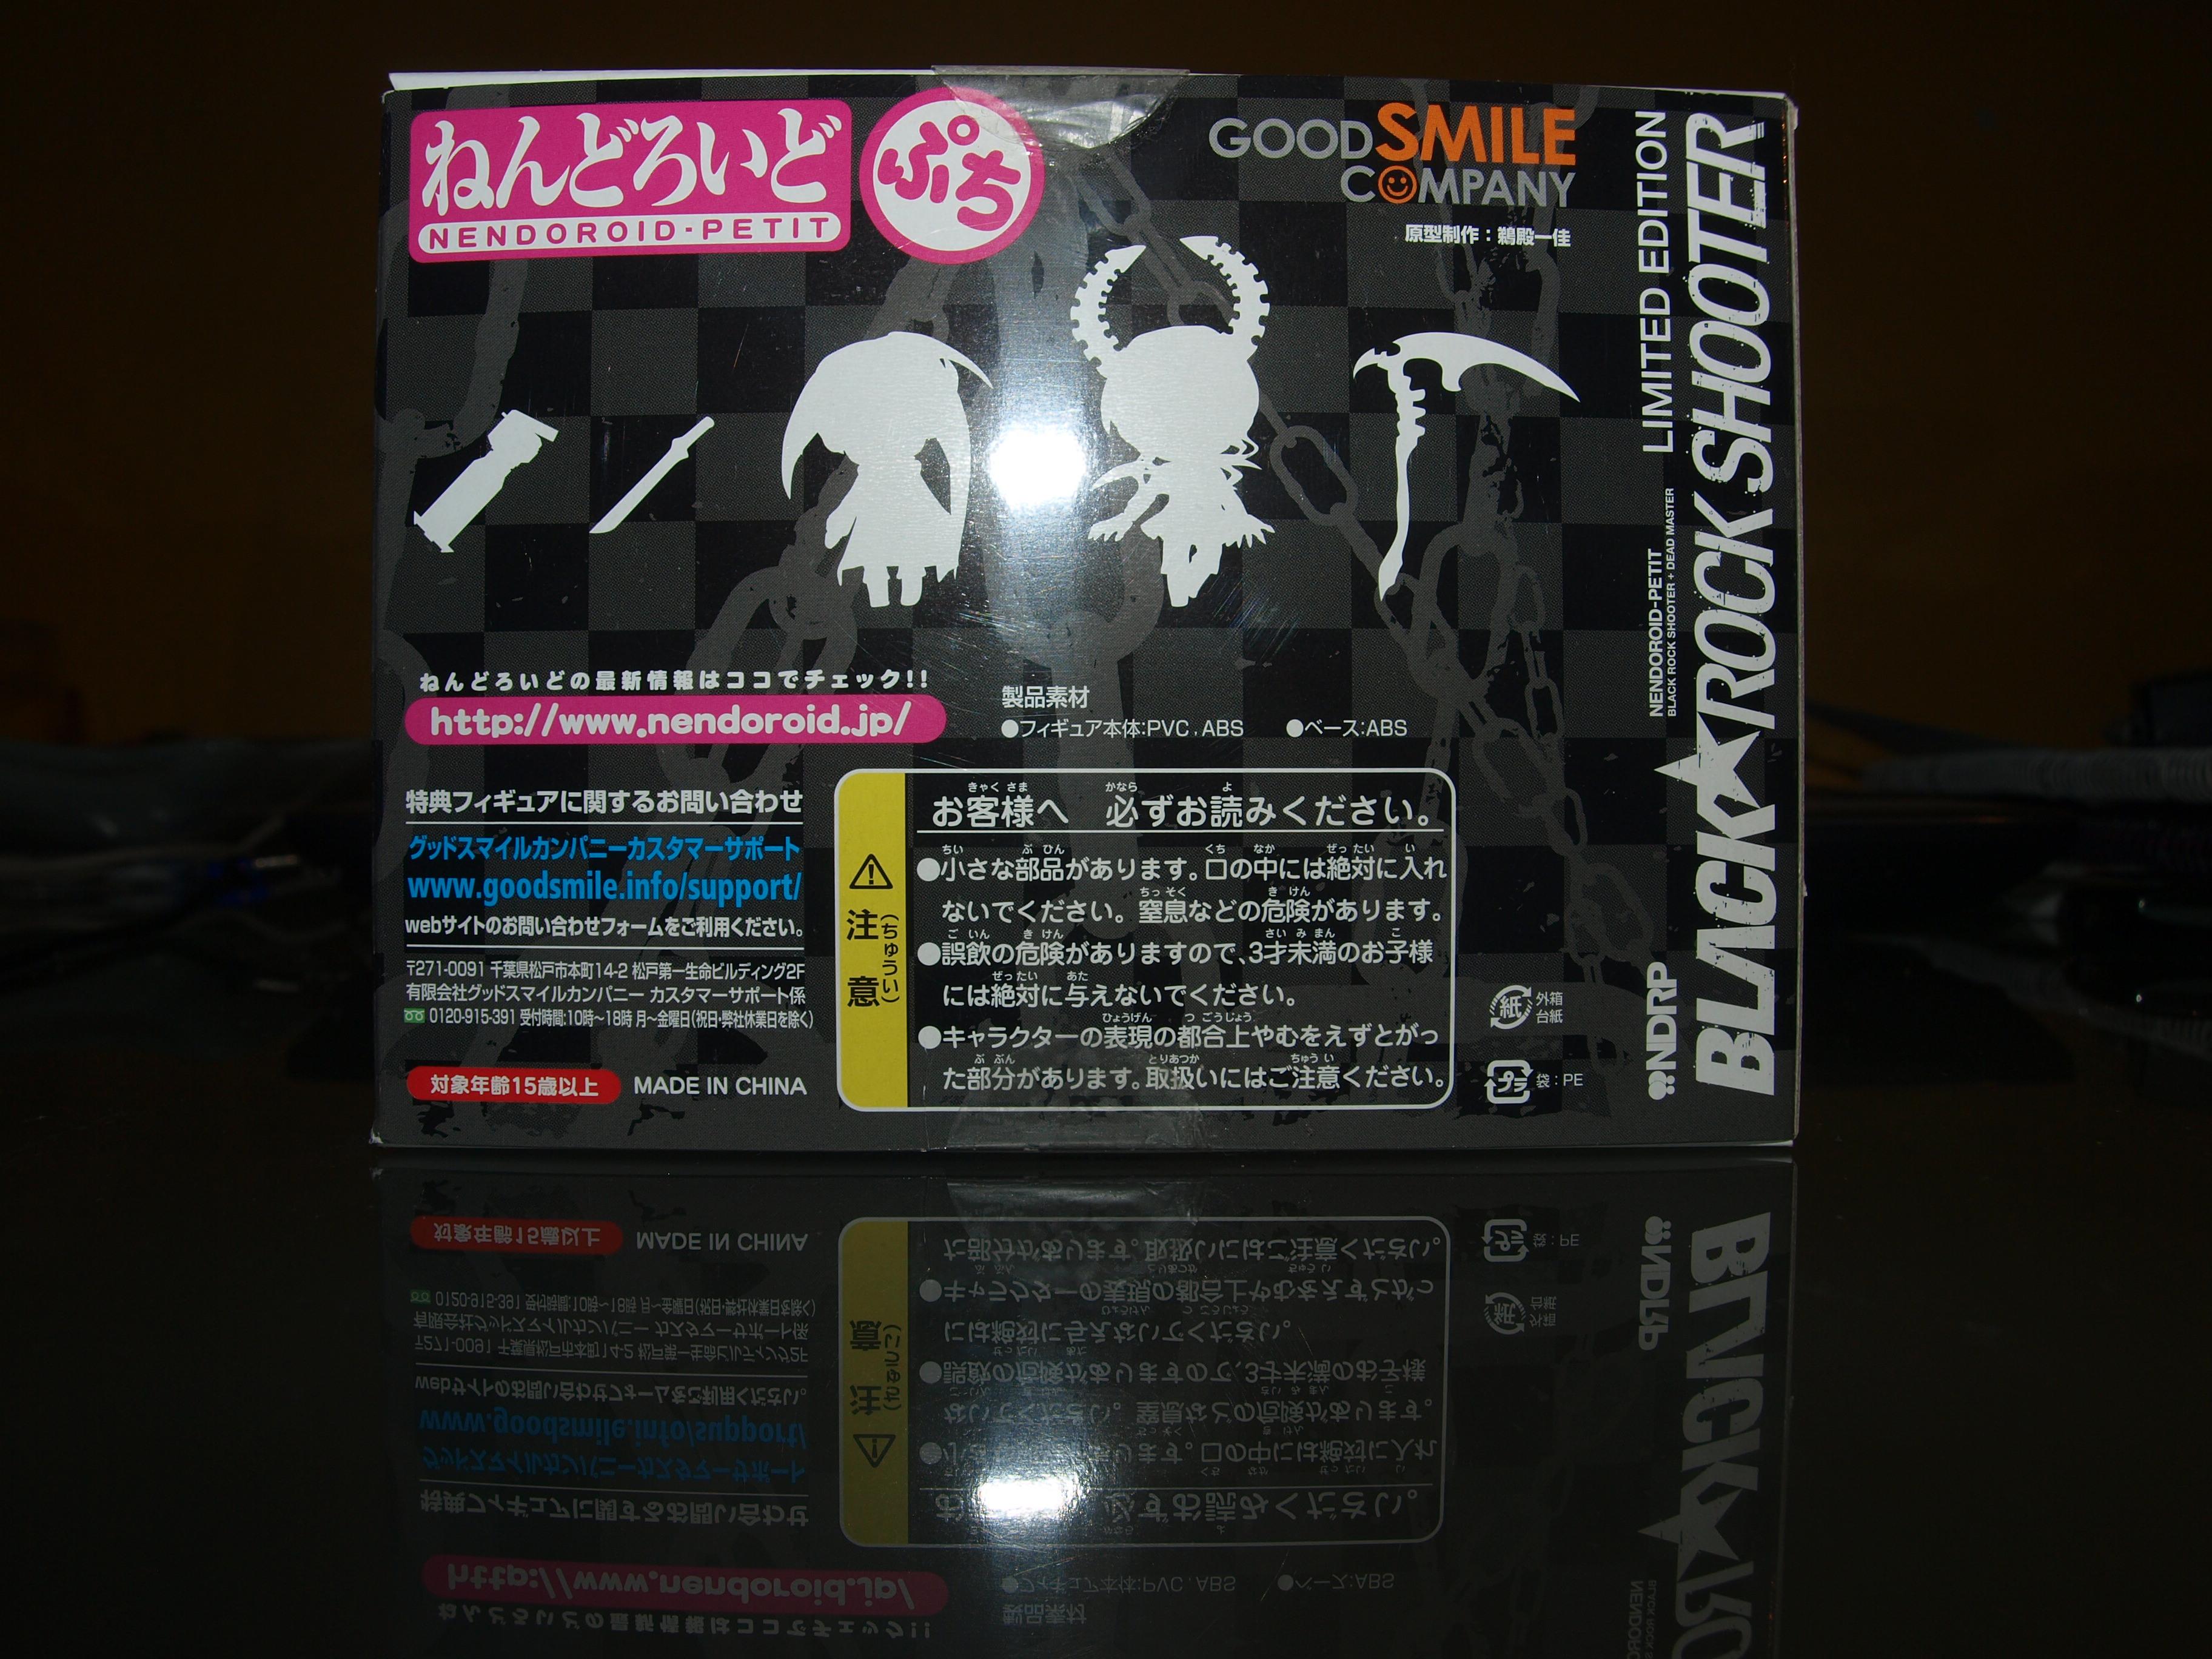 huke black_★_rock_shooter b★rs_project ordet yoshioka_shinobu blu-ray